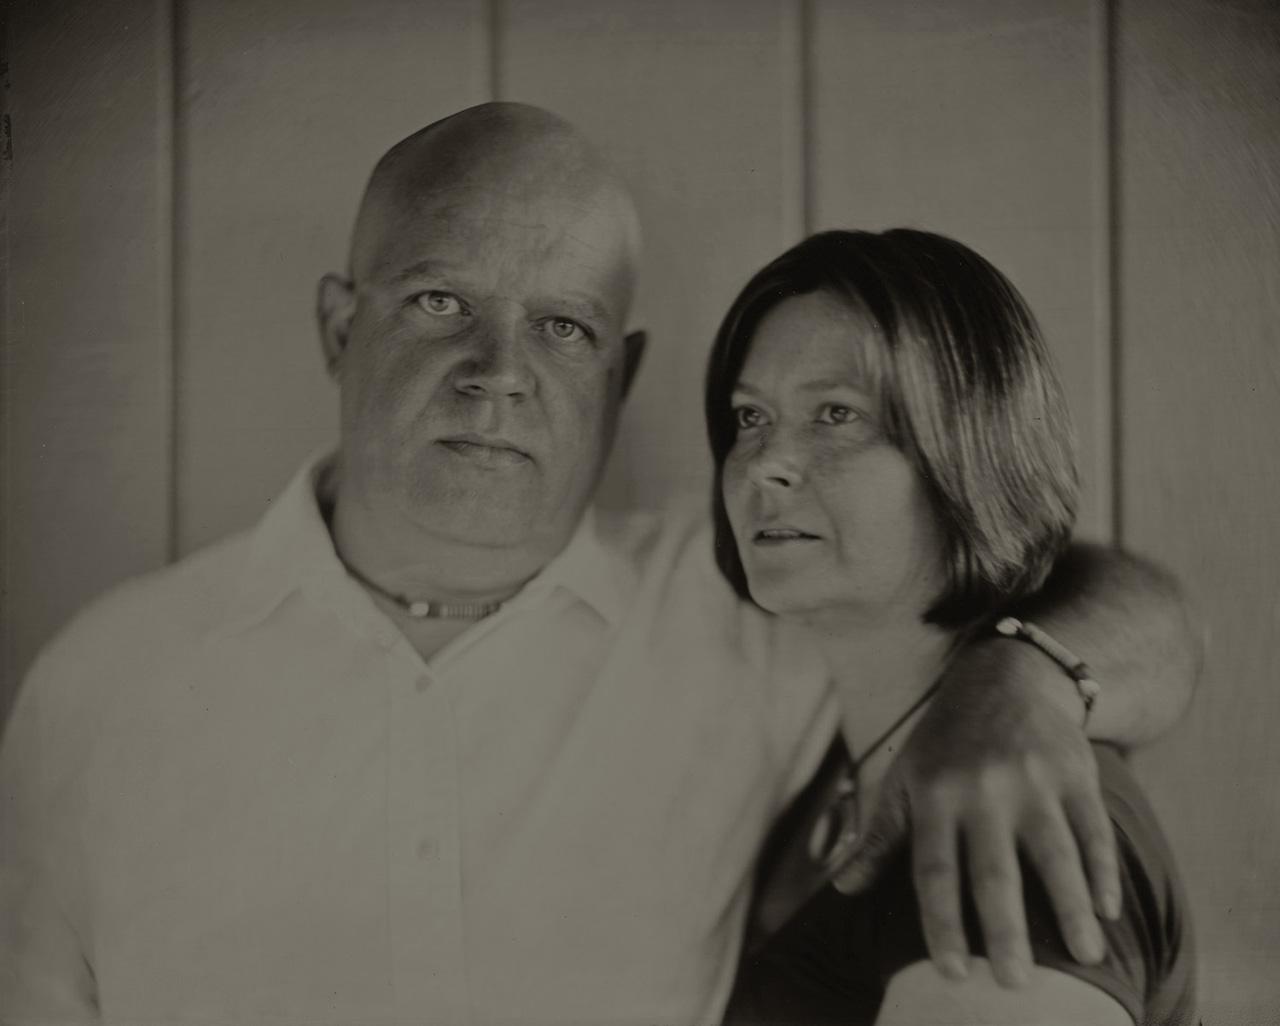 Carl and Liz